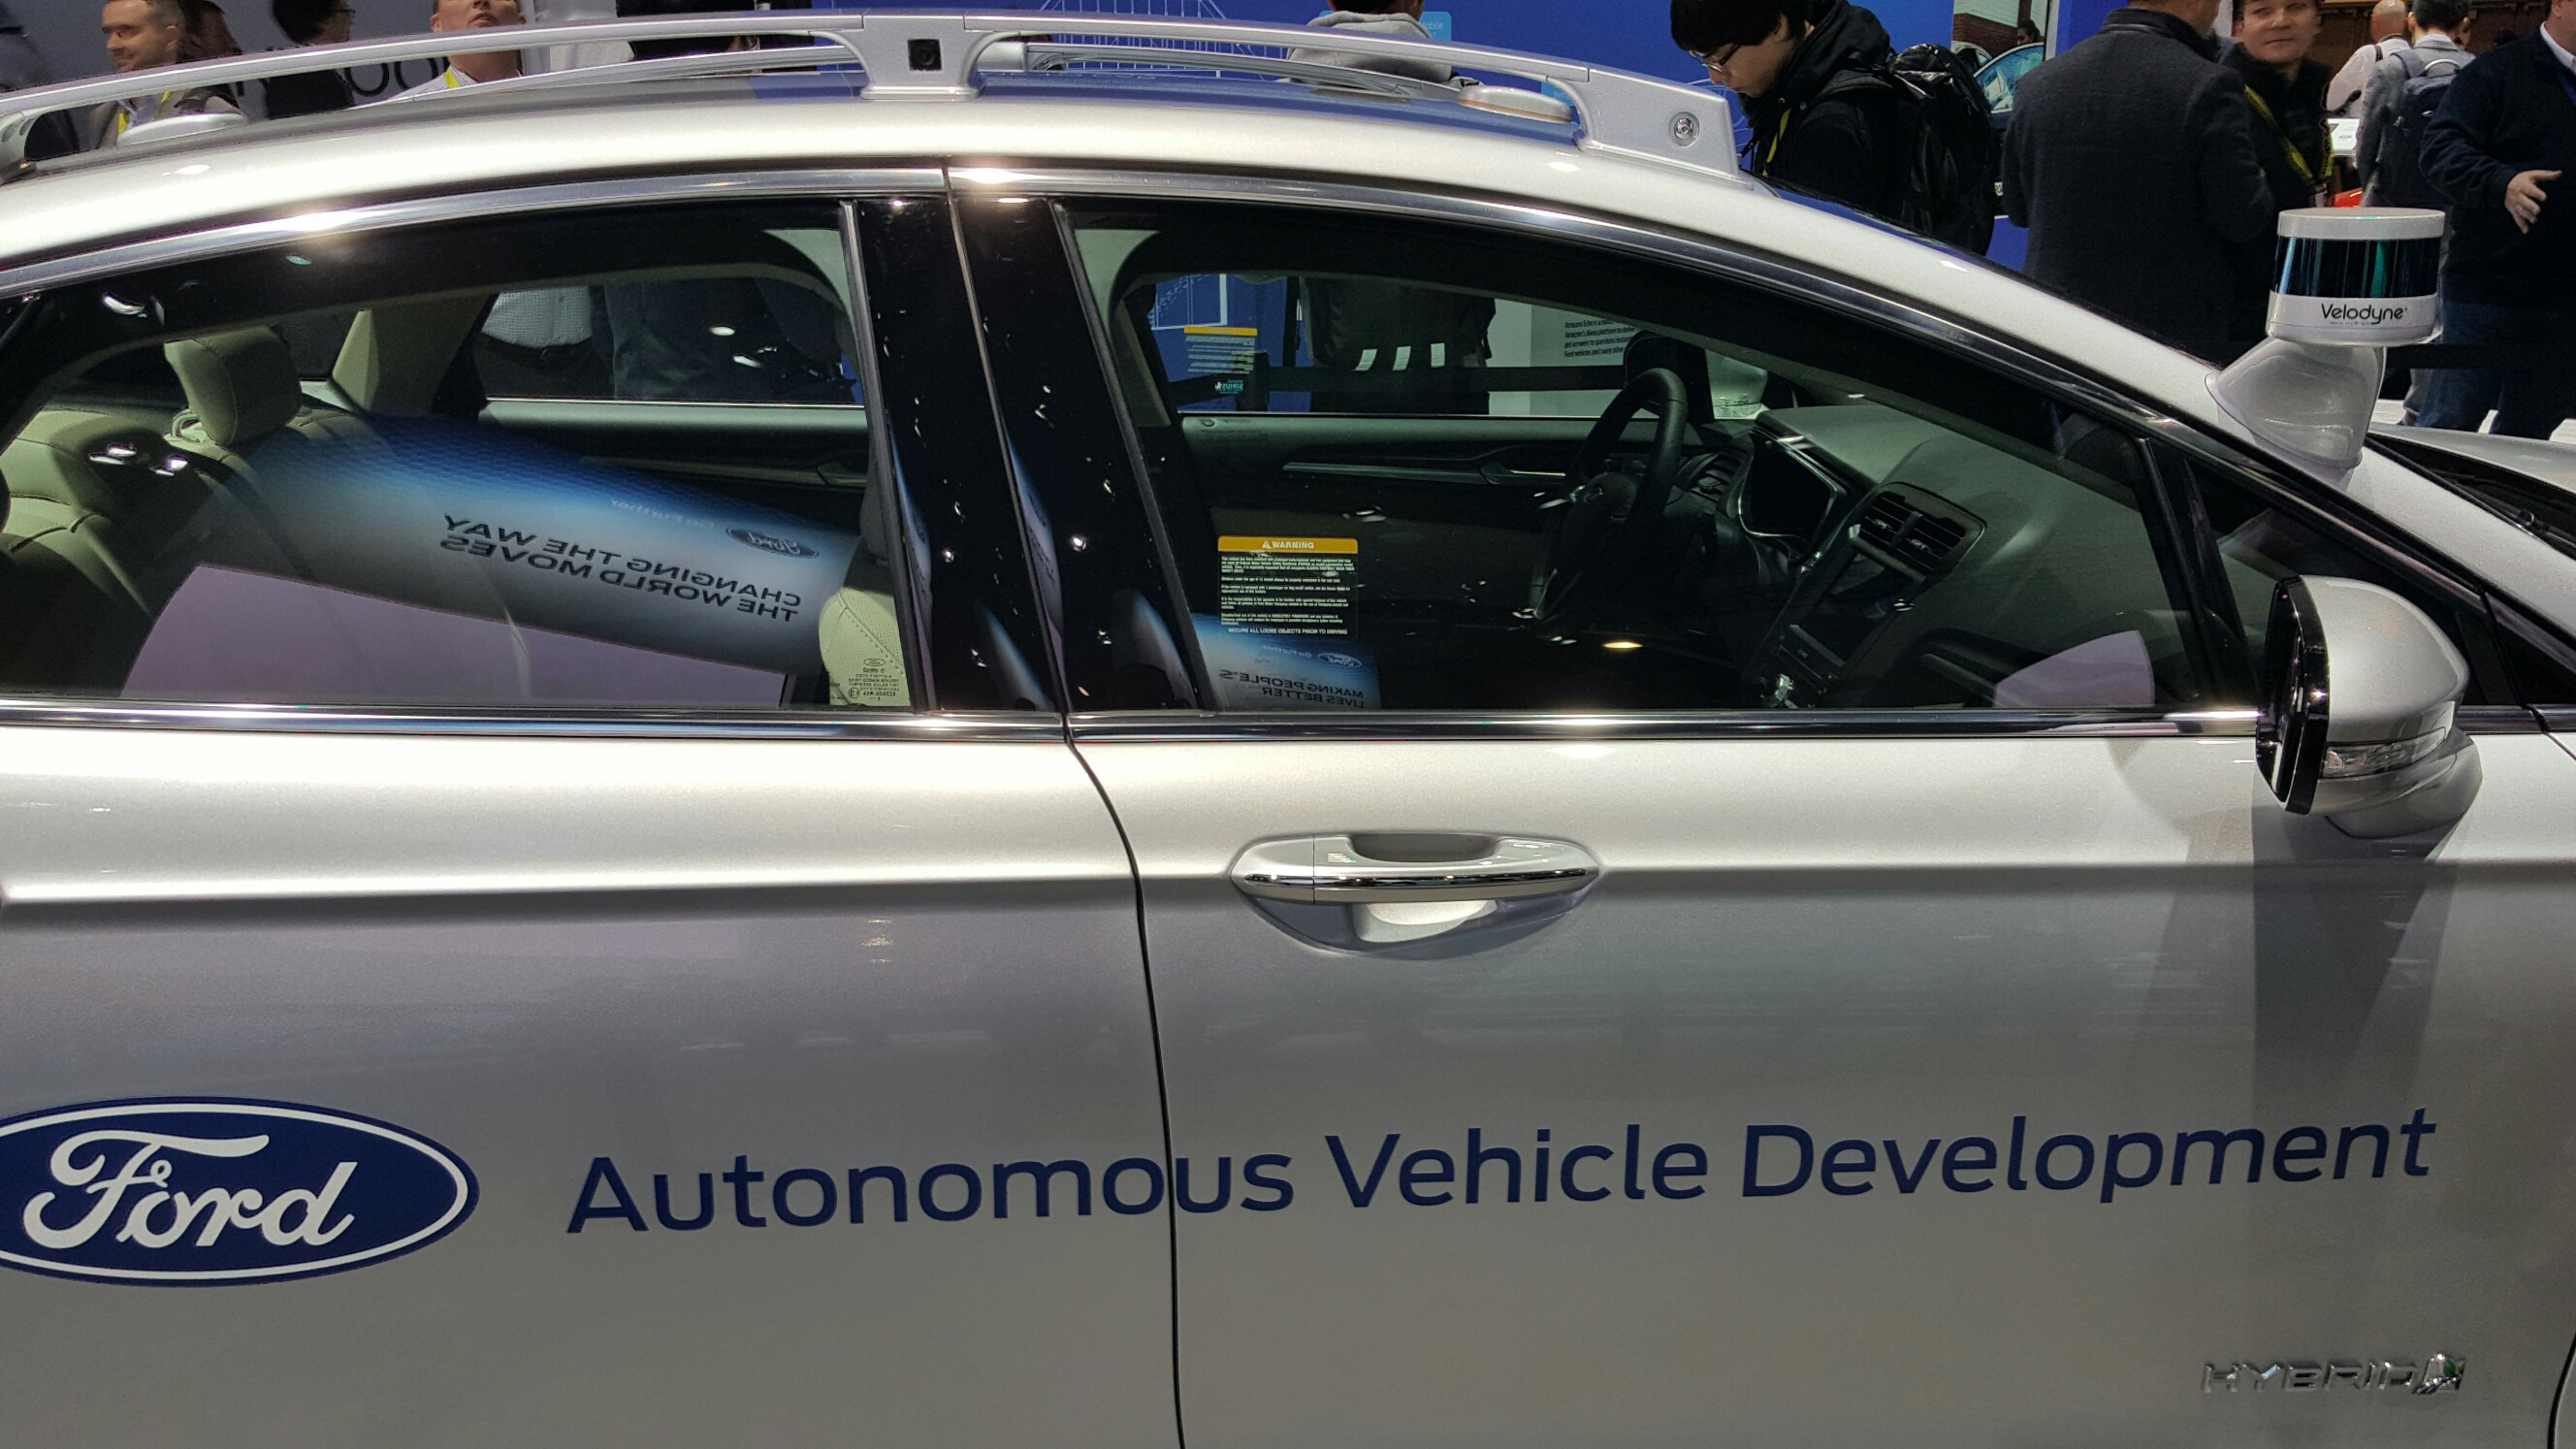 Ford to Move Autonomous Vehicle Divison to Detroit | Driverless Report